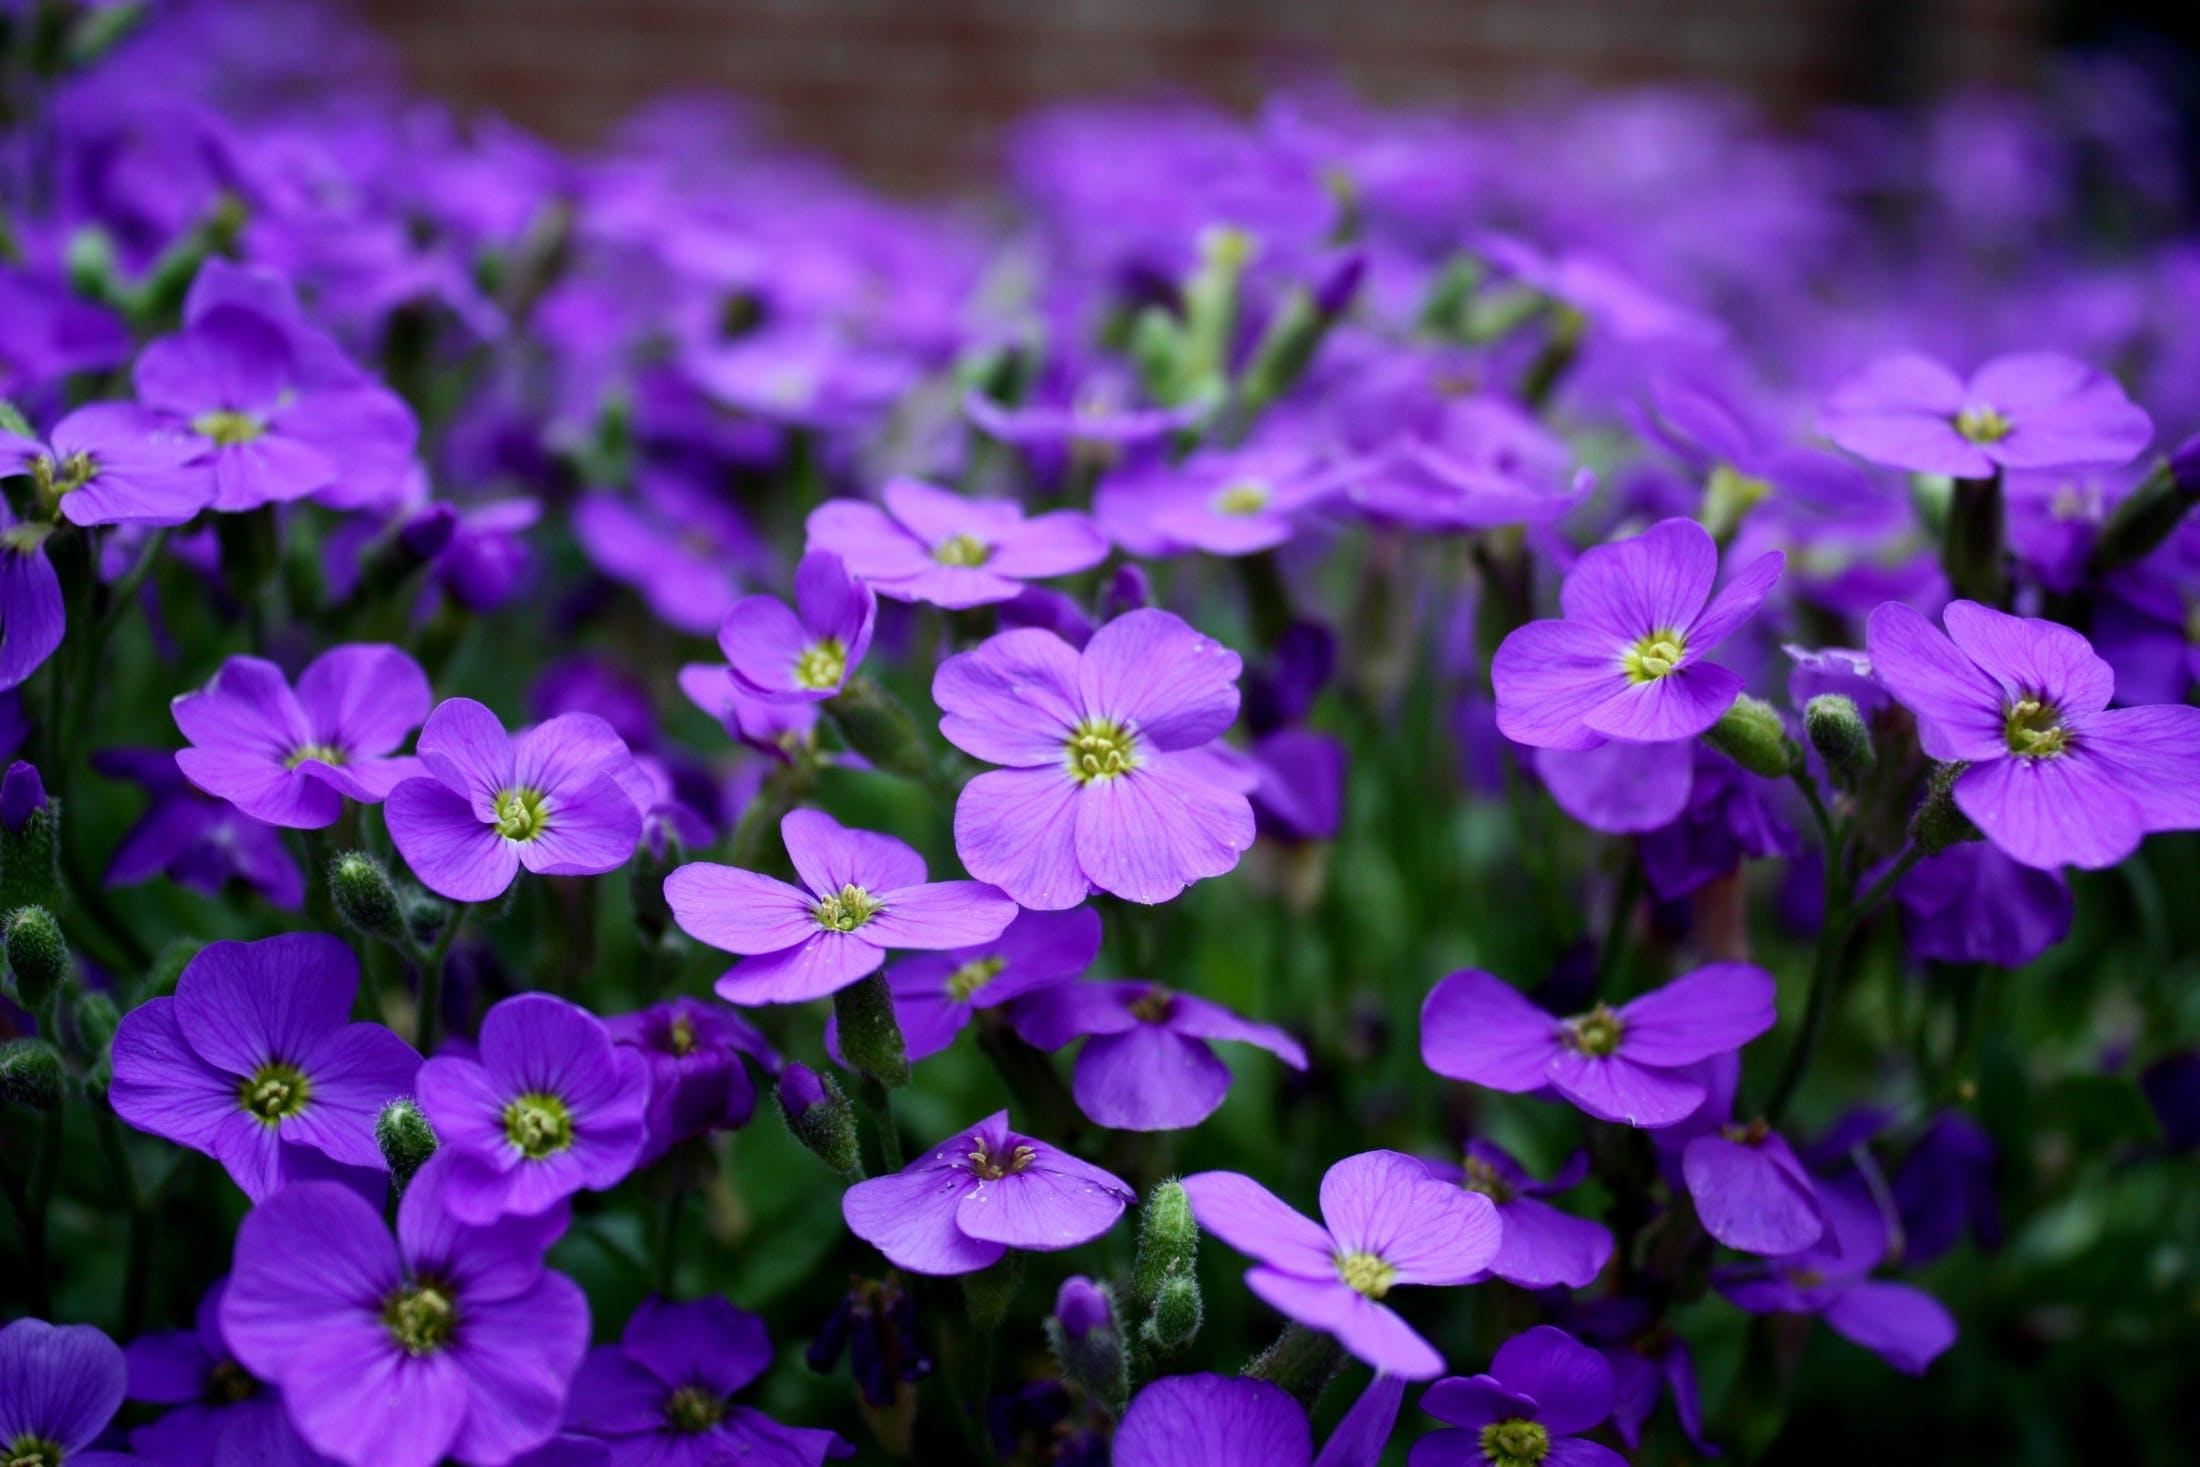 Free stock photo of nature, flowers, purple, plant